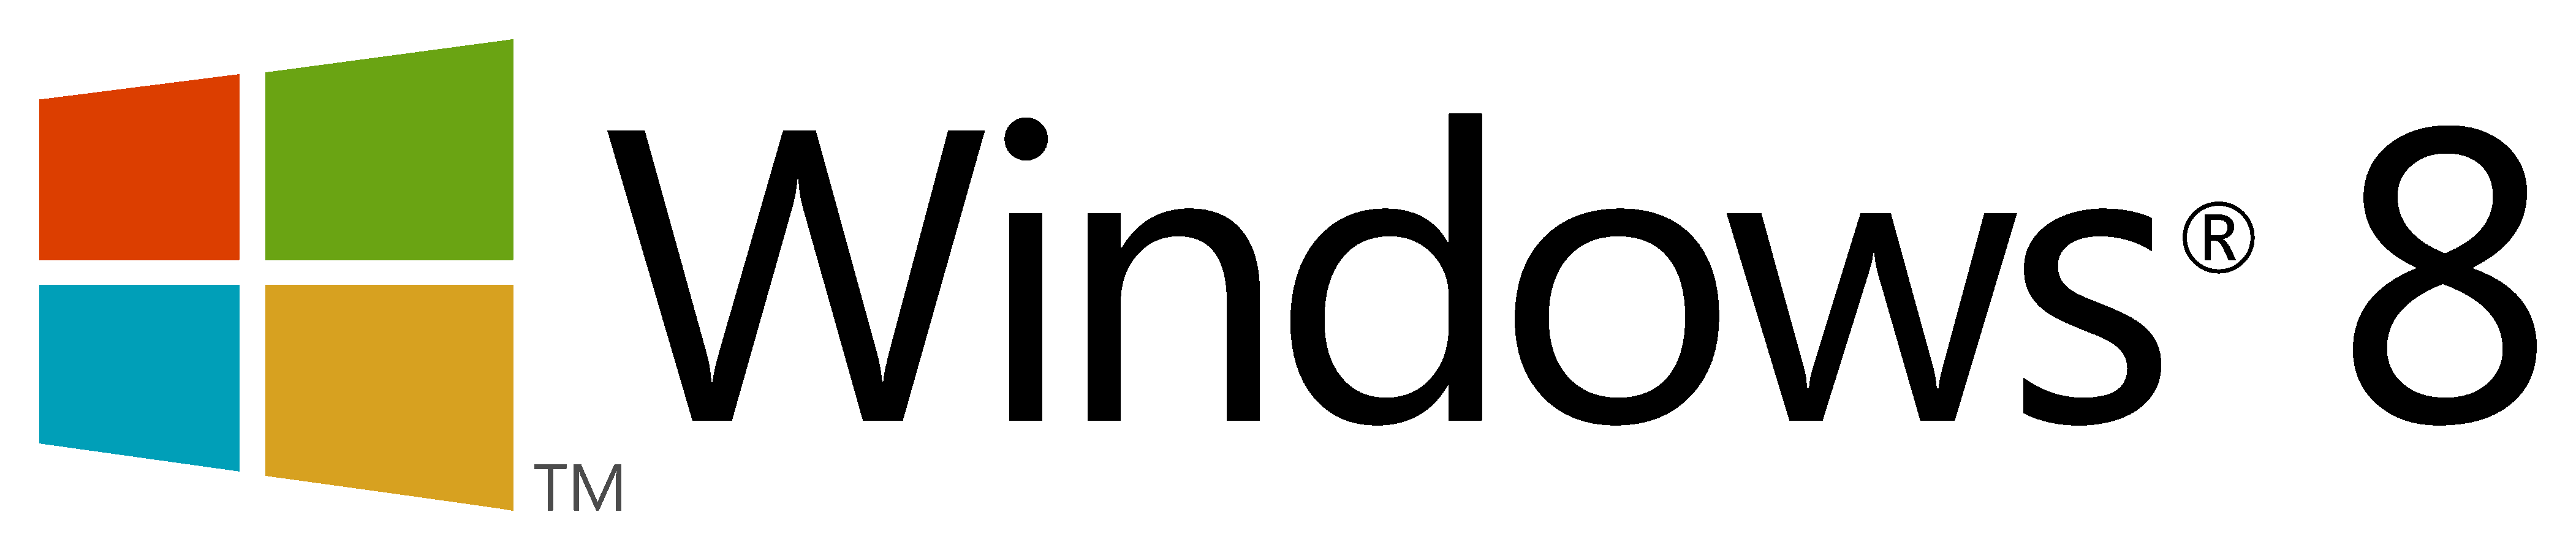 windows logo PNG - Microsoft Windows PNG